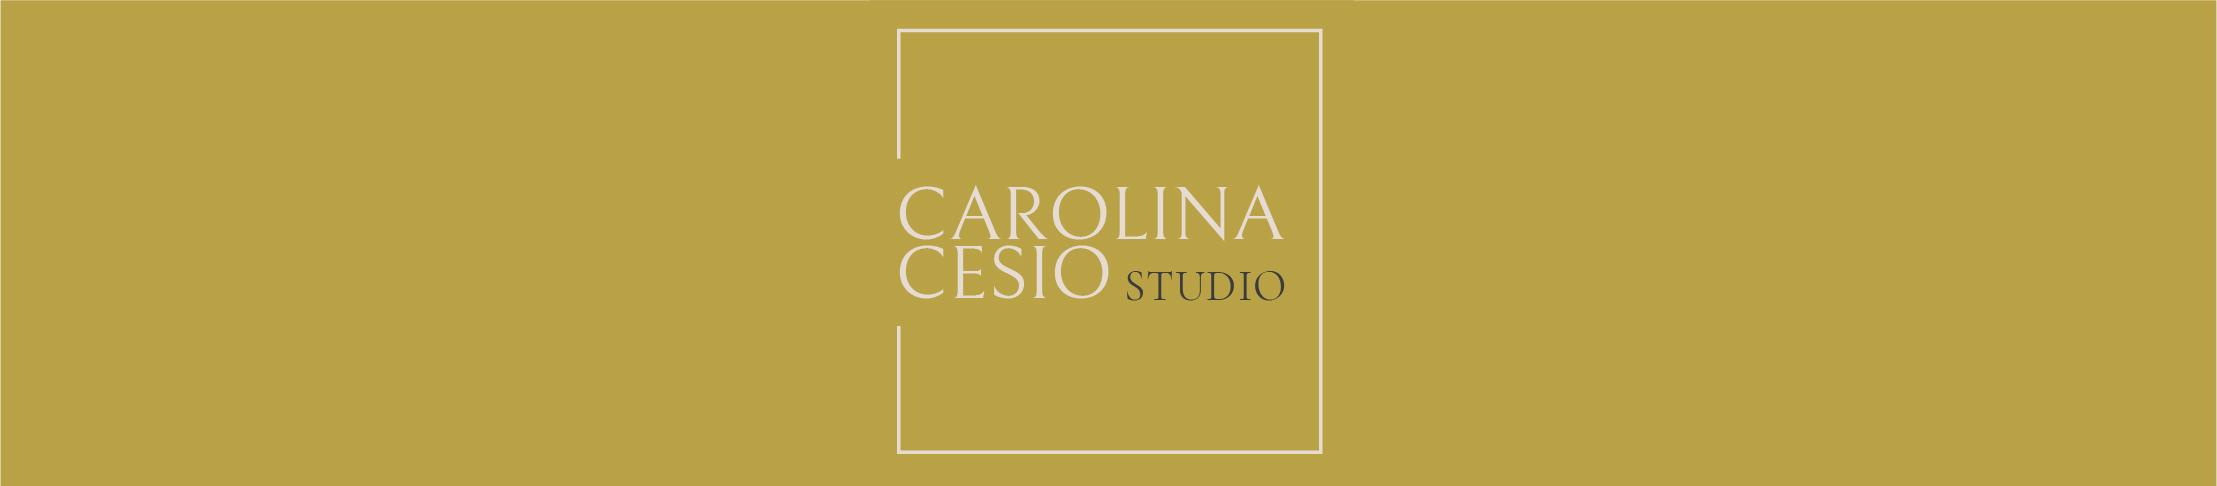 Carolina Cesio